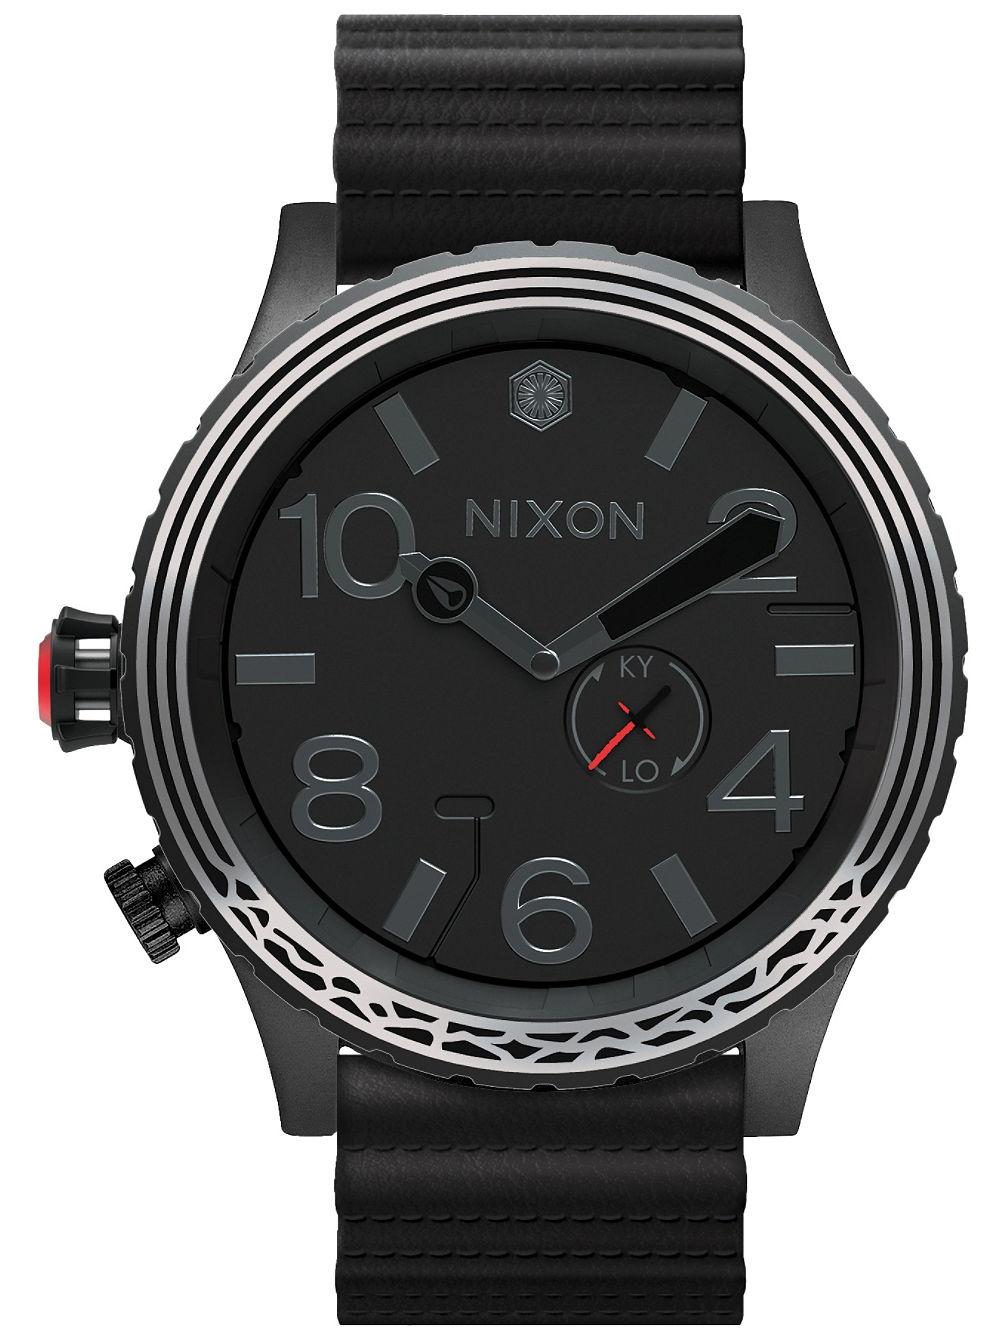 nixon the 51 30 leather star wars uhr online kaufen bei. Black Bedroom Furniture Sets. Home Design Ideas